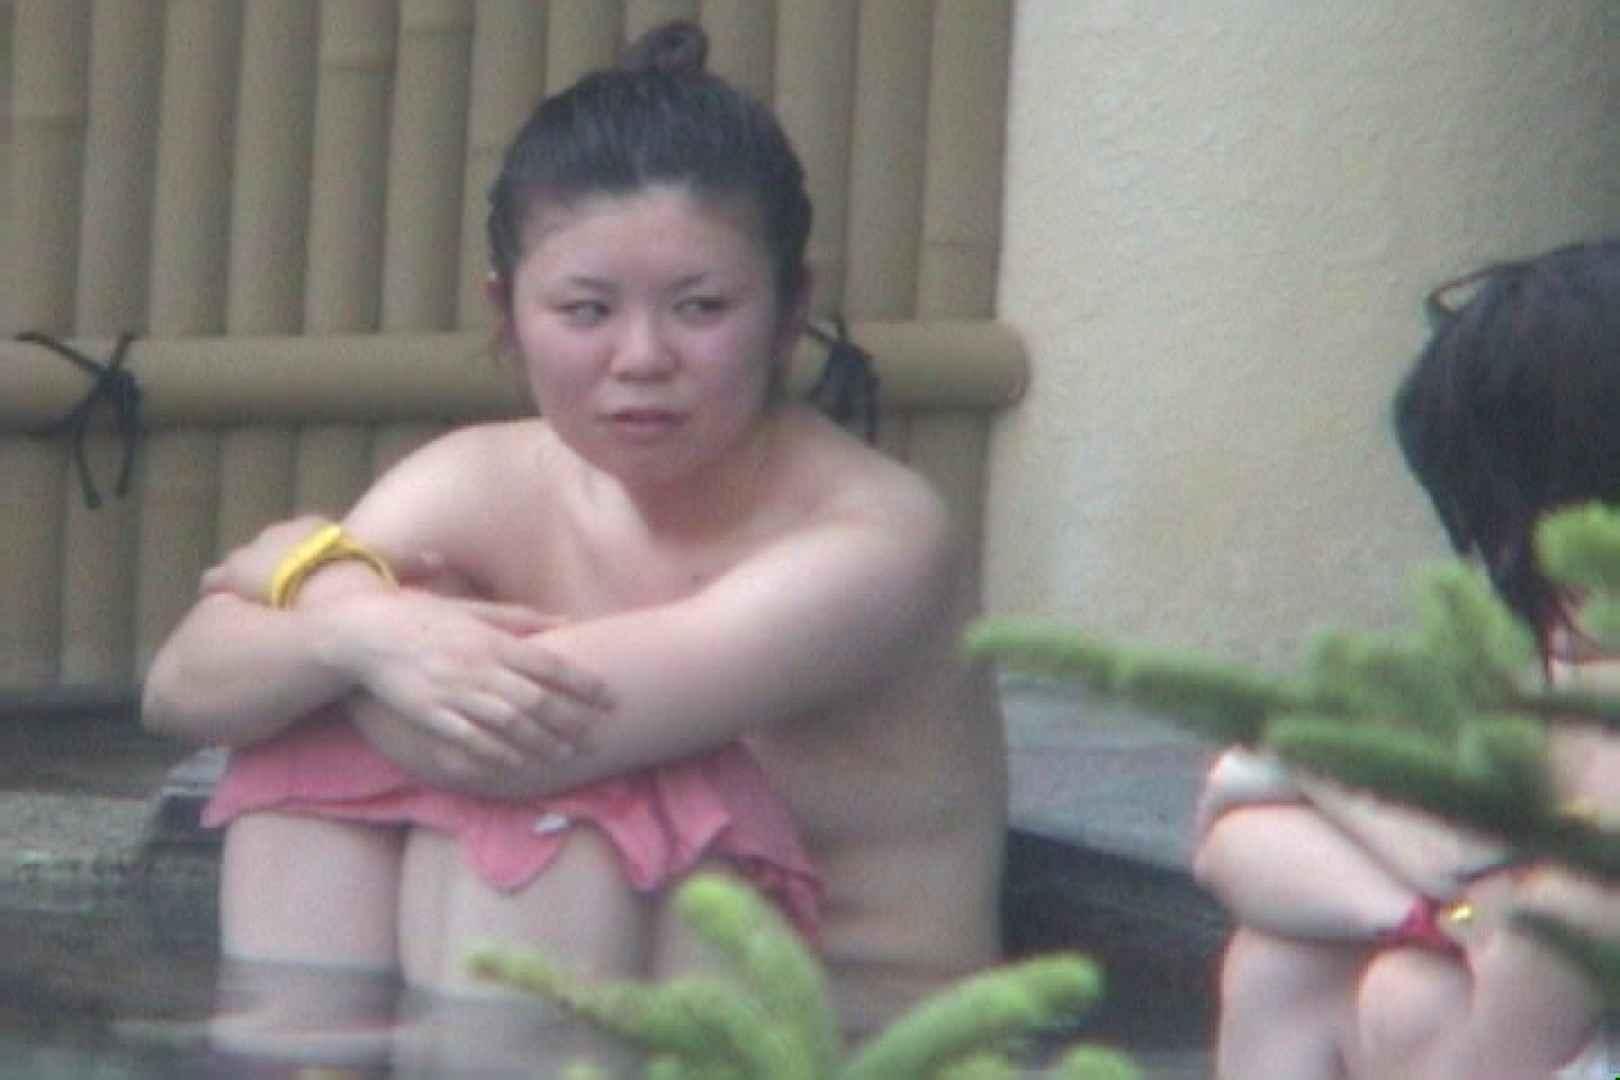 Aquaな露天風呂Vol.47【VIP限定】 女体盗撮 盗み撮りAV無料動画キャプチャ 105連発 11